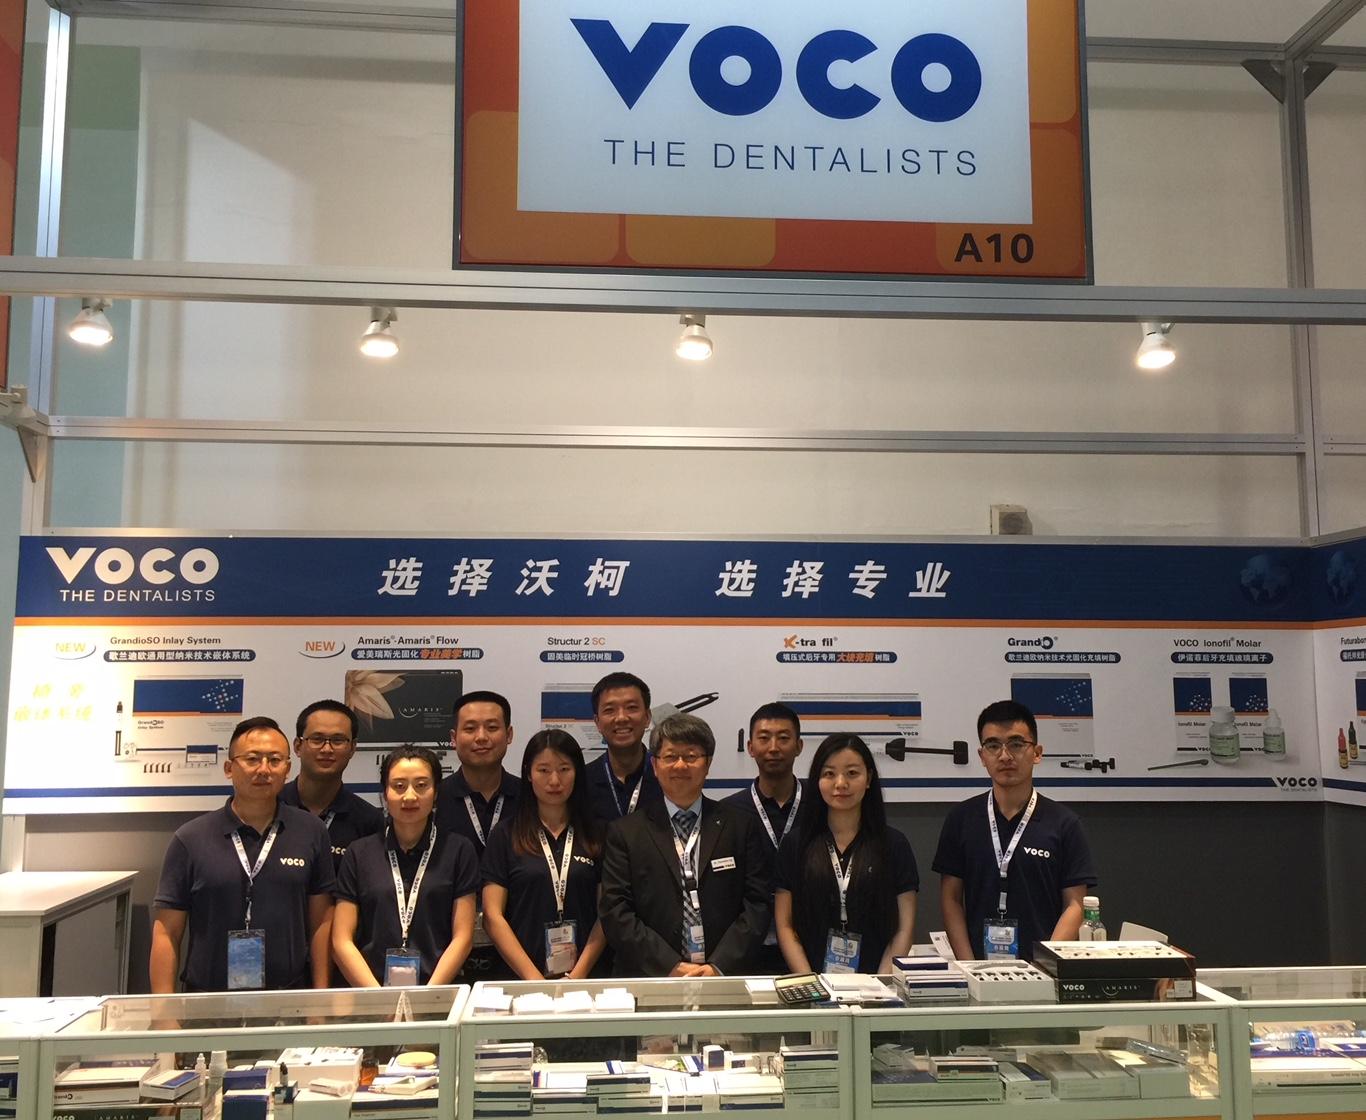 VOCO中国团队在展台(前排左四为东亚区域经理骆博士)